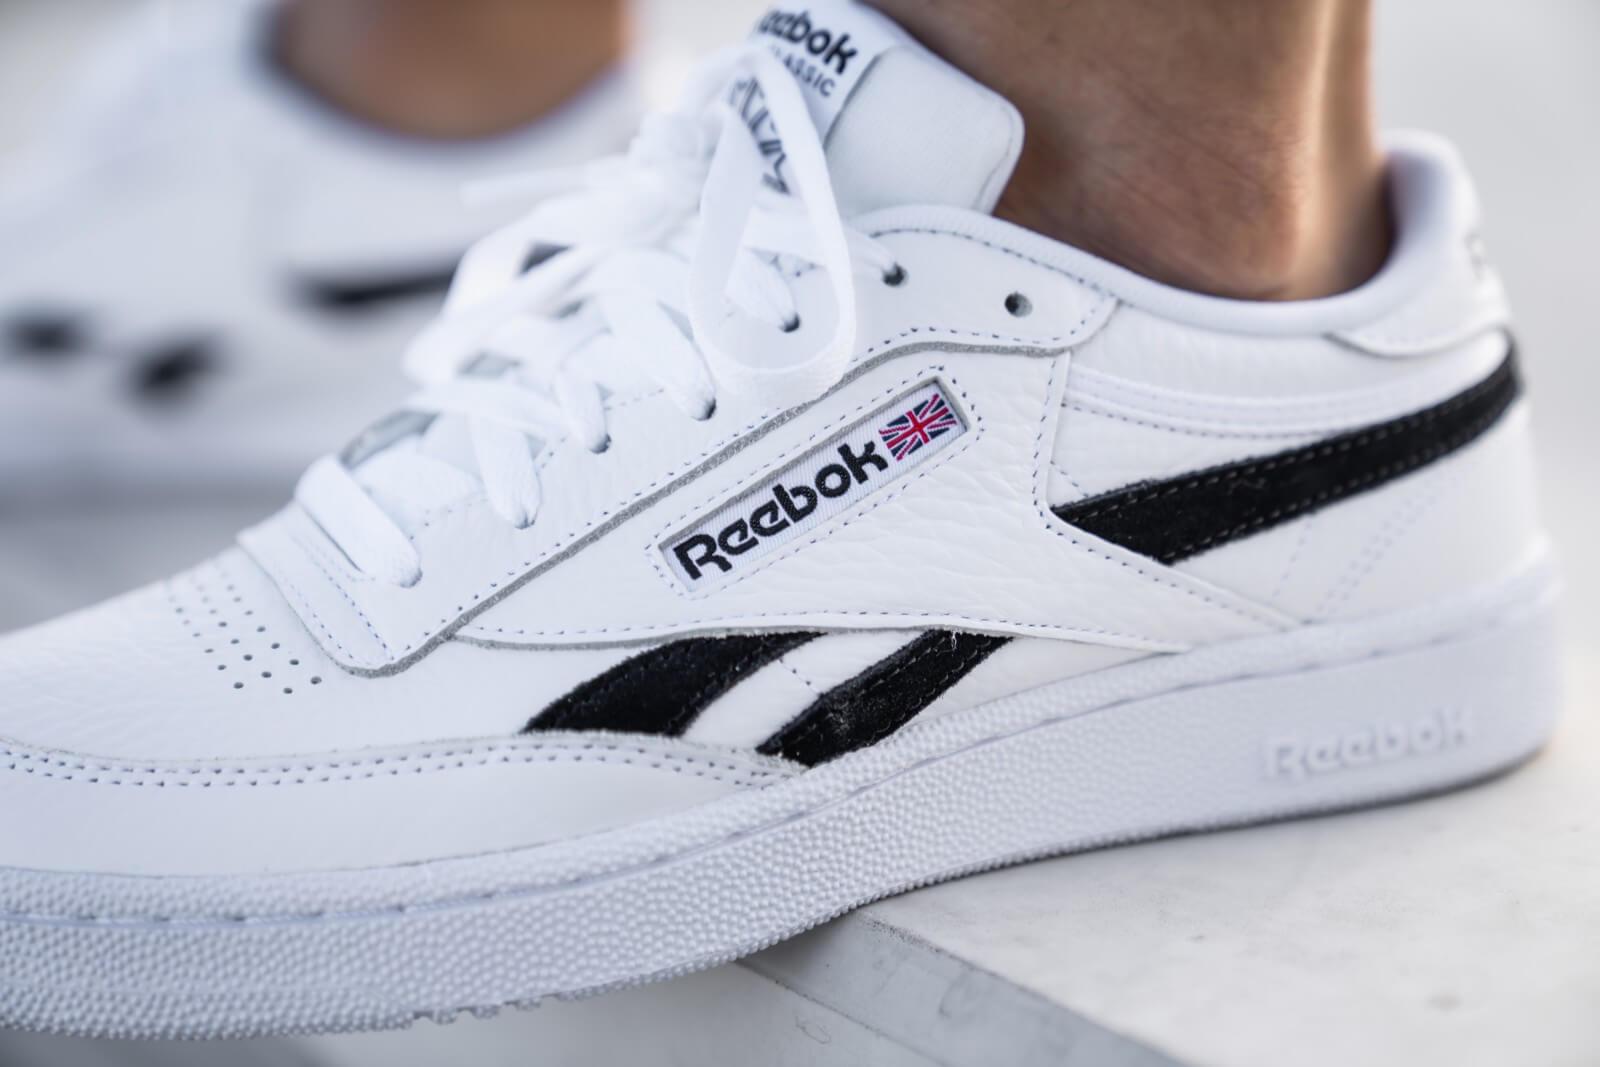 Reebok Club C Revenge Leather Sneakers Chalkblnaco